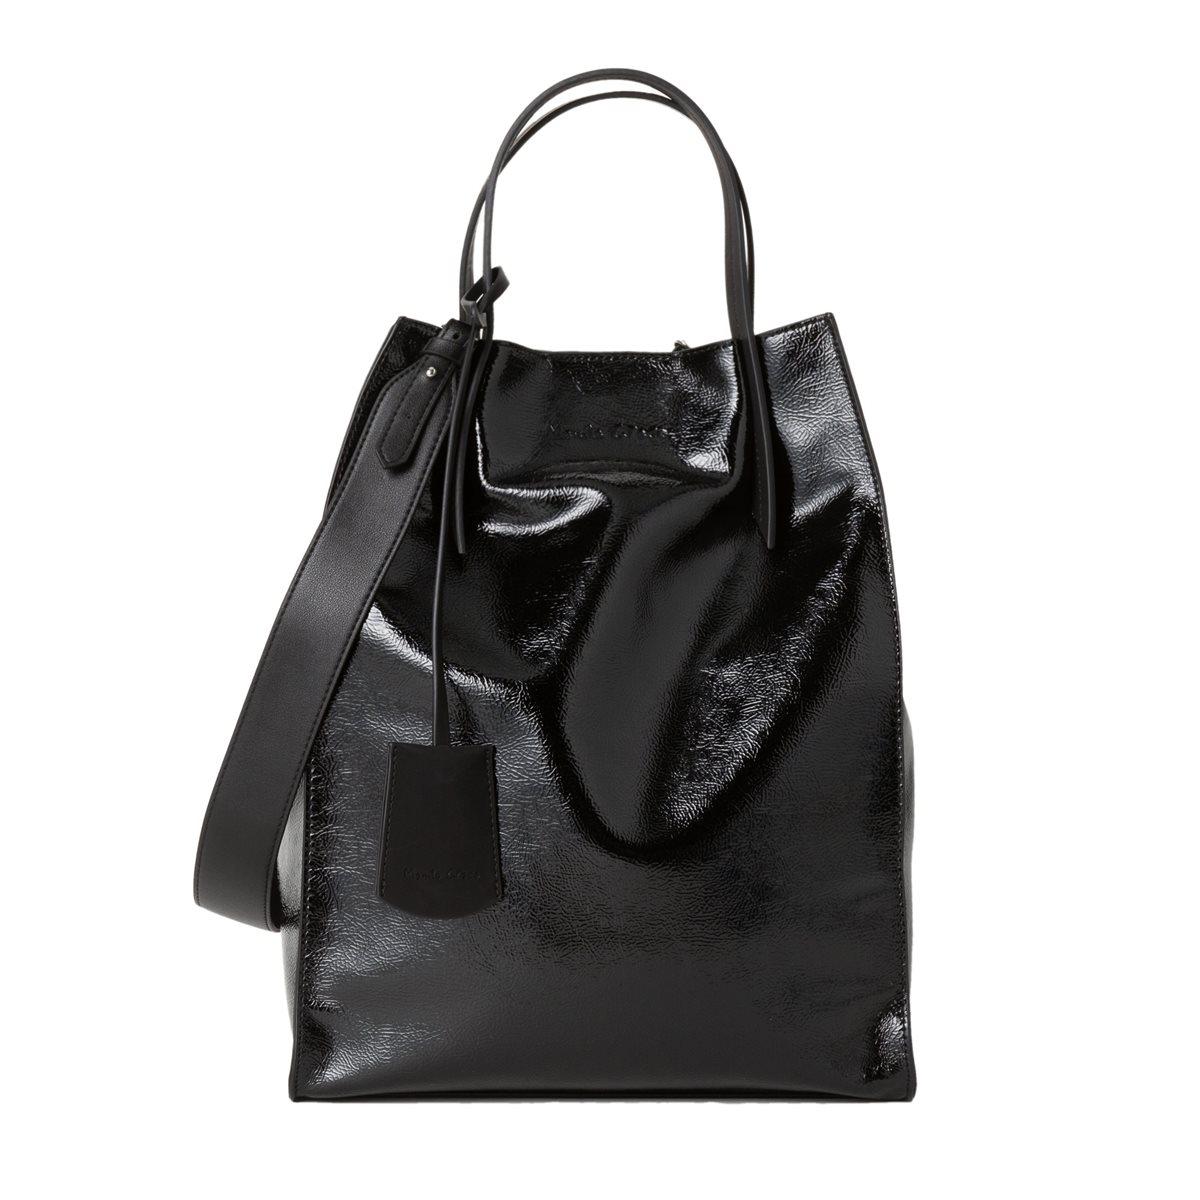 Manila Grace Felicia bag